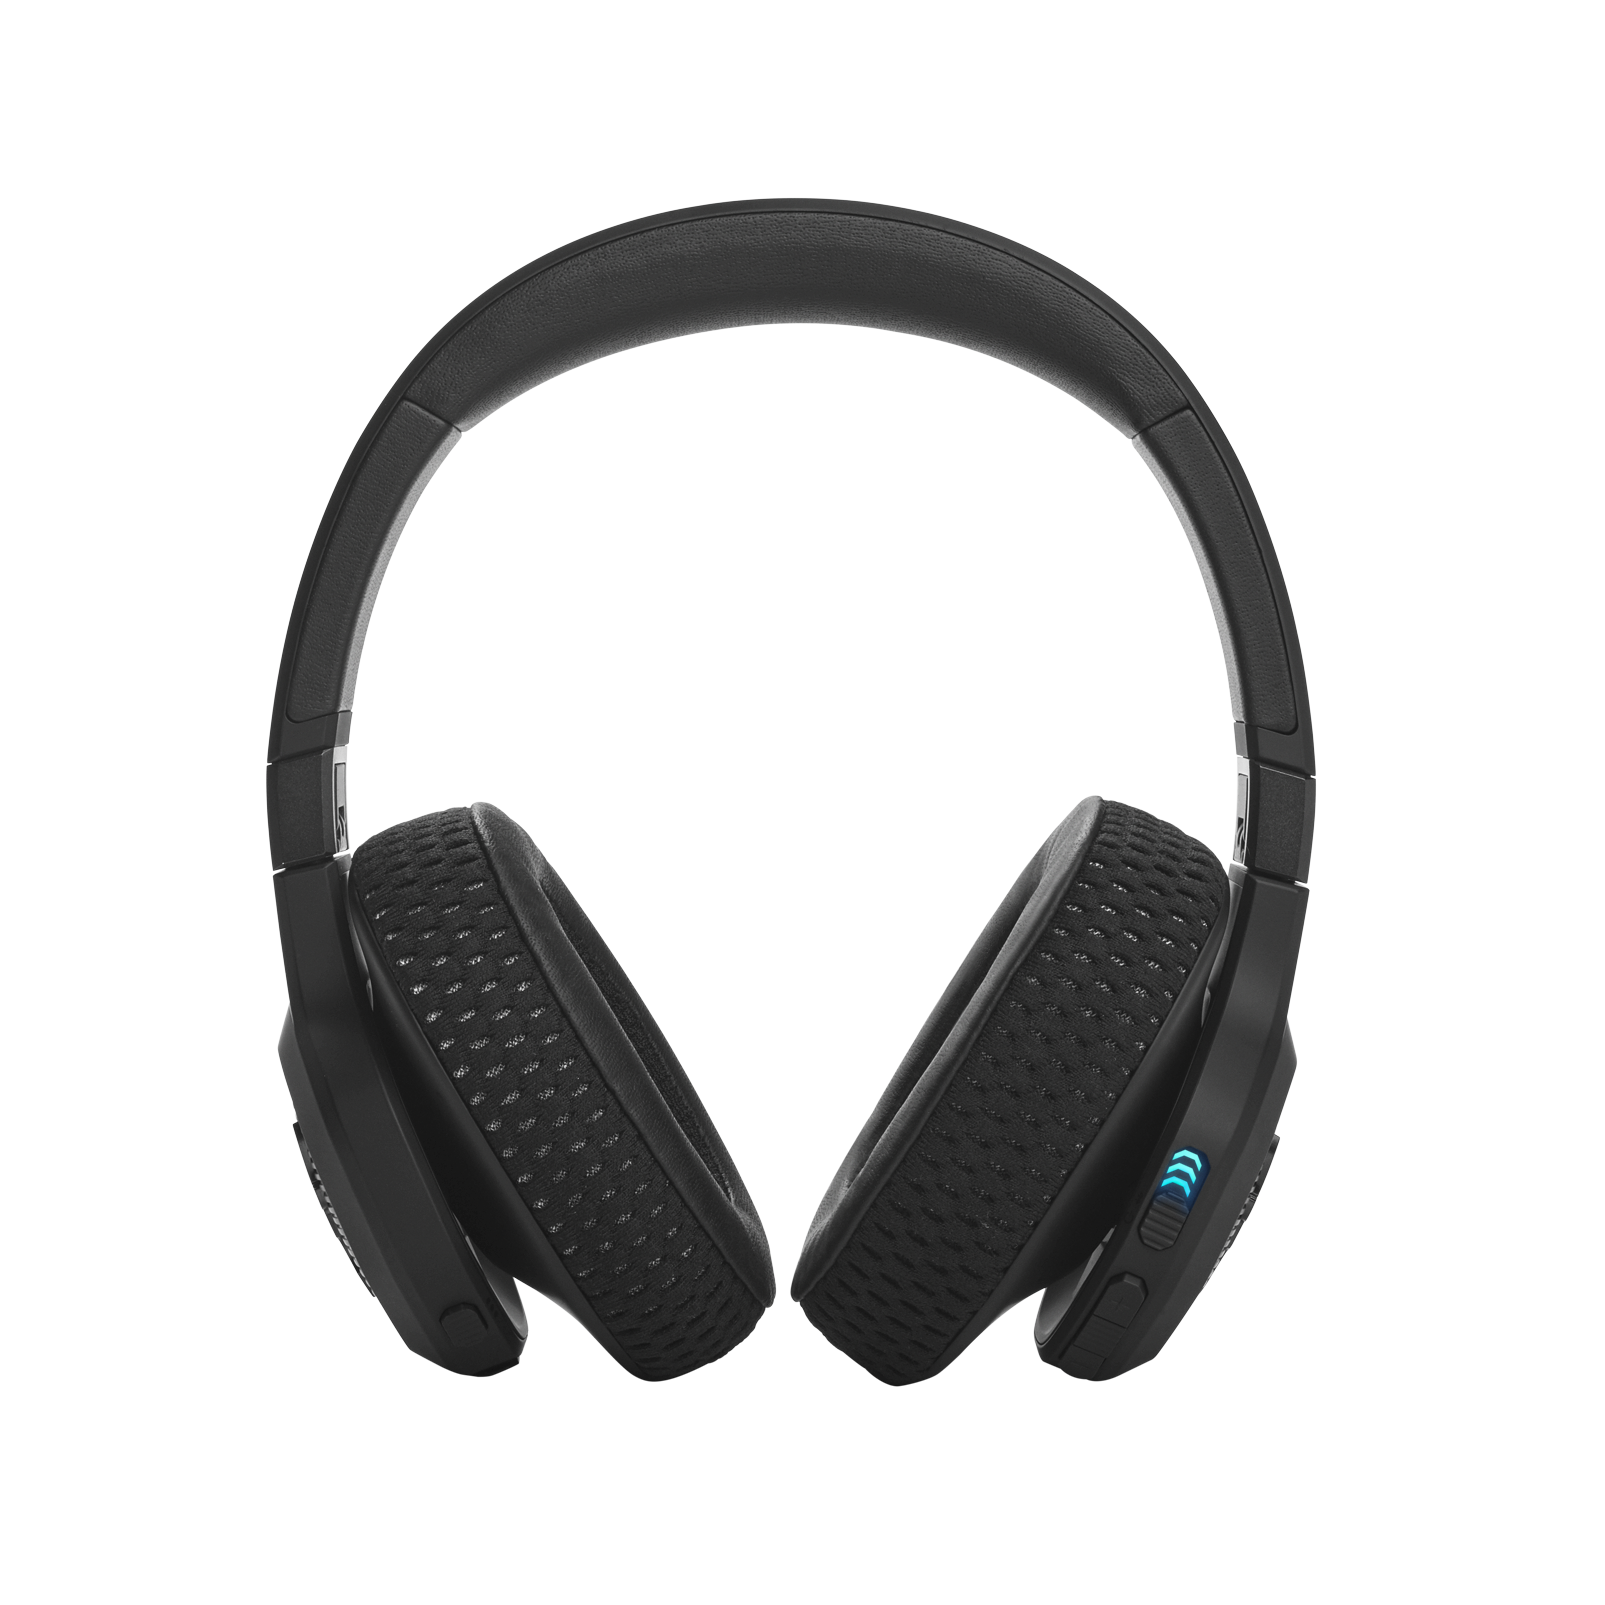 UA Project Rock Over-Ear Training Headphones - Engineered by JBL - Black - Over-Ear ANC Sport Headphones - Back